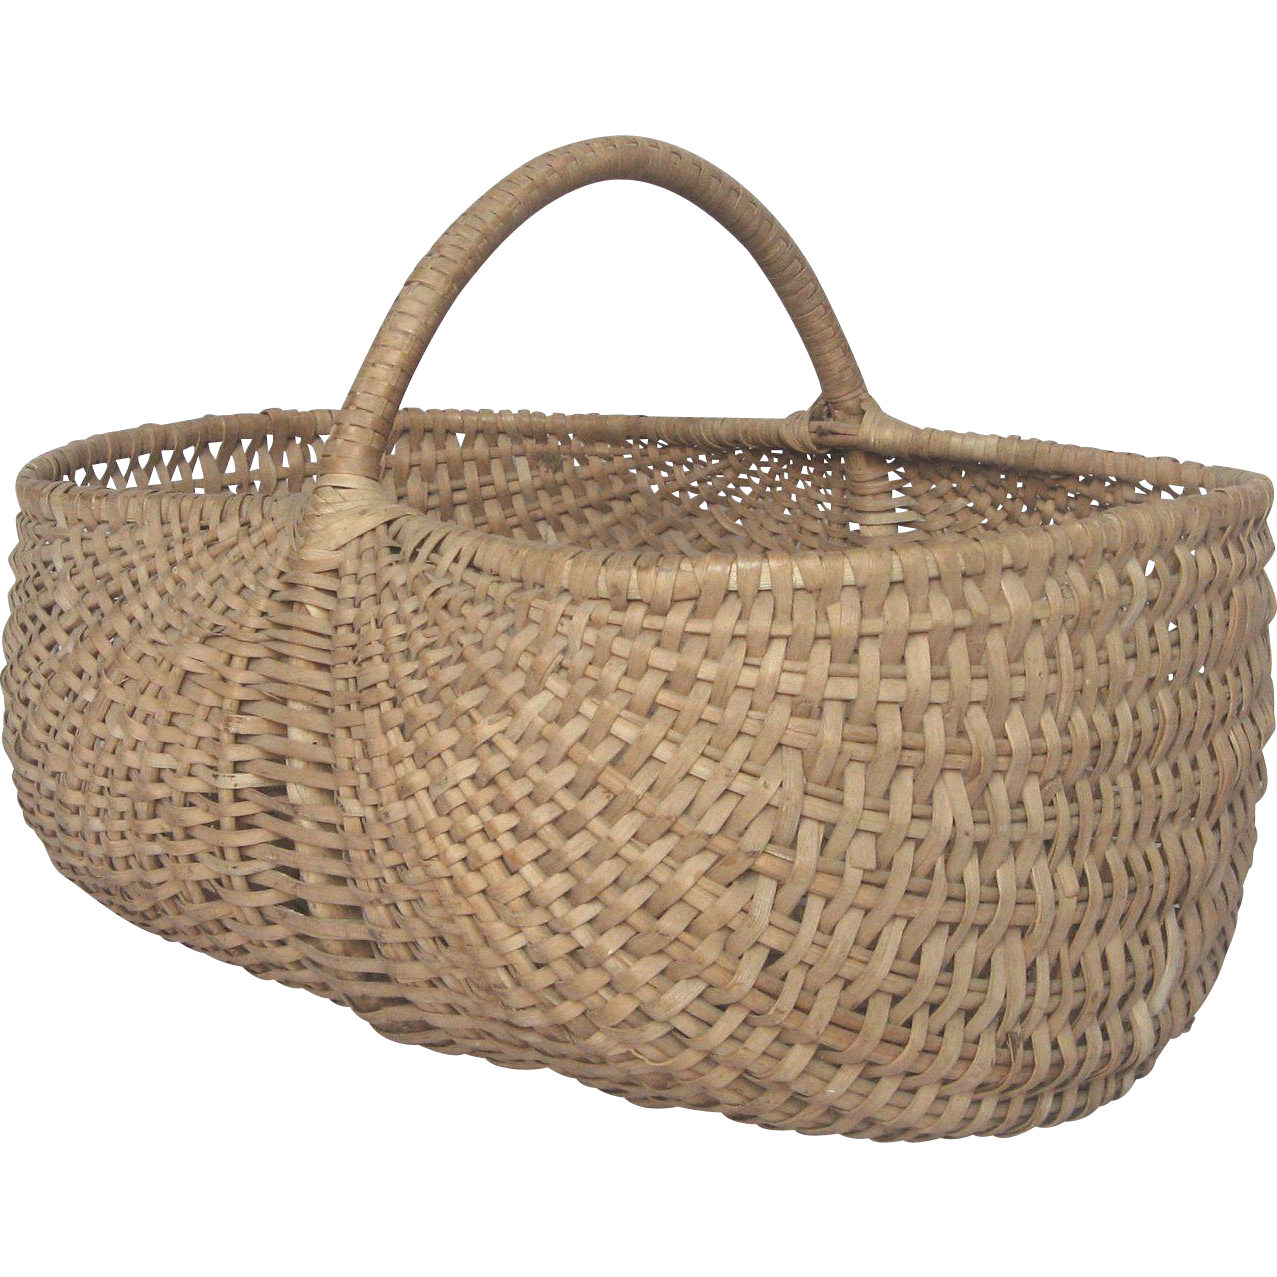 Woven Gathering Basket : Large capacity french woven harvest gathering basket